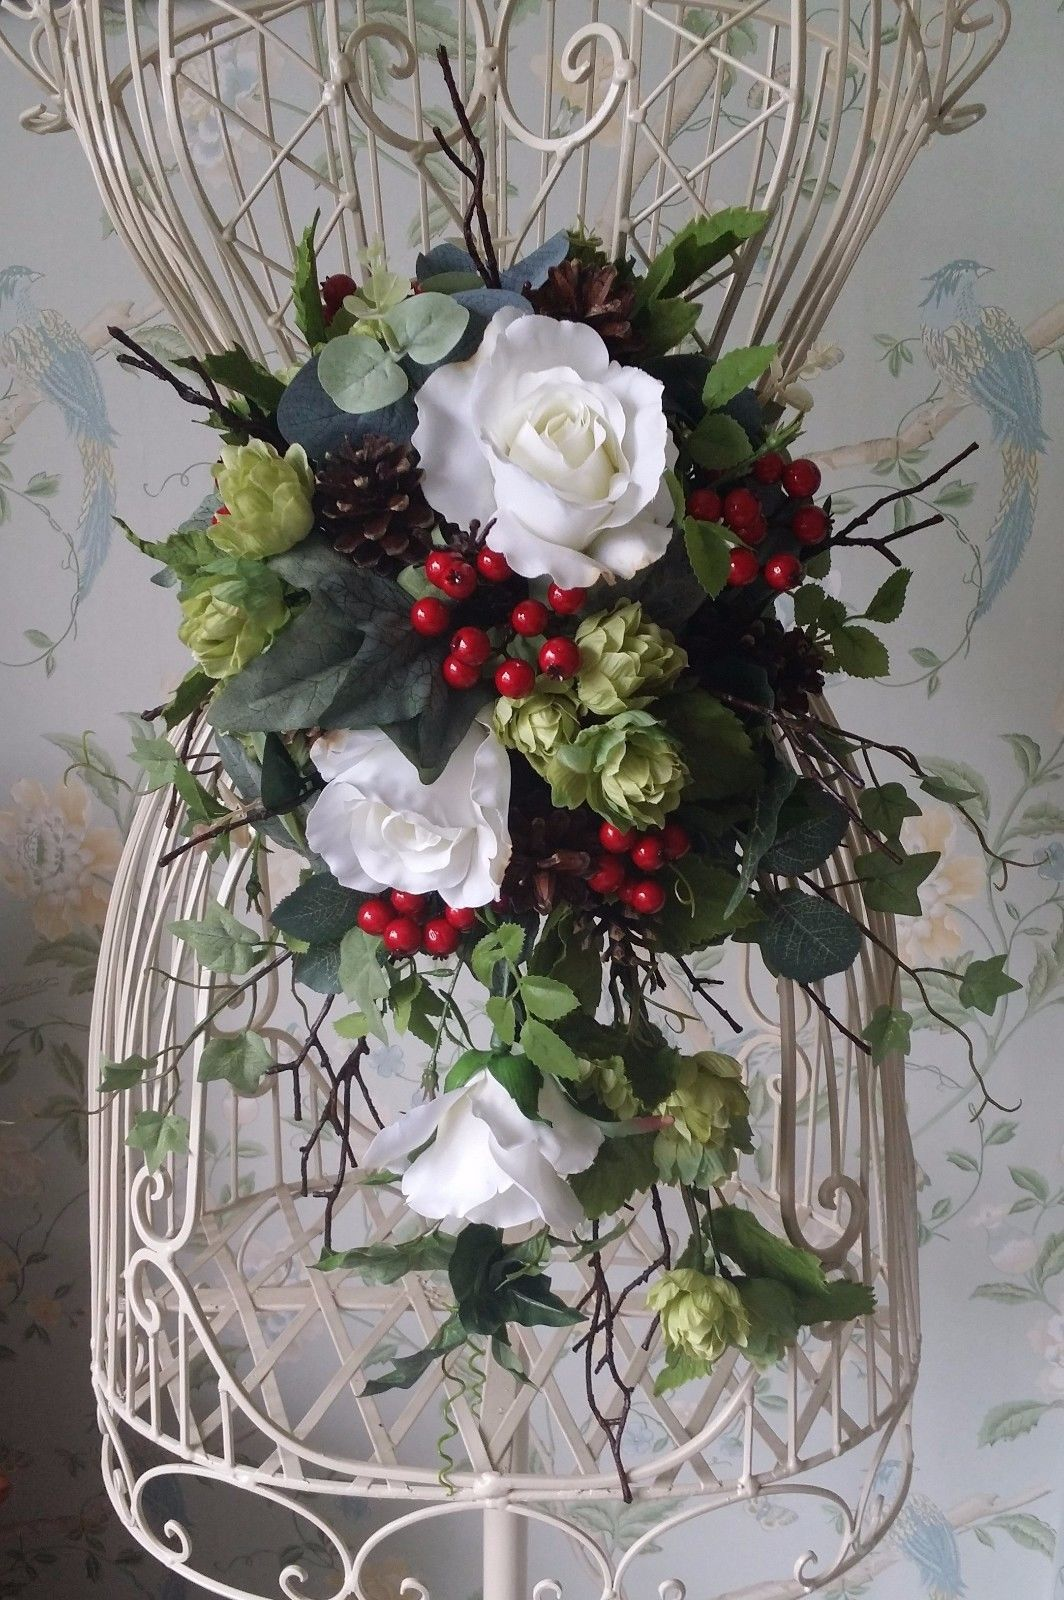 Details about Autumn Winter Rose Christmas Silk Brides